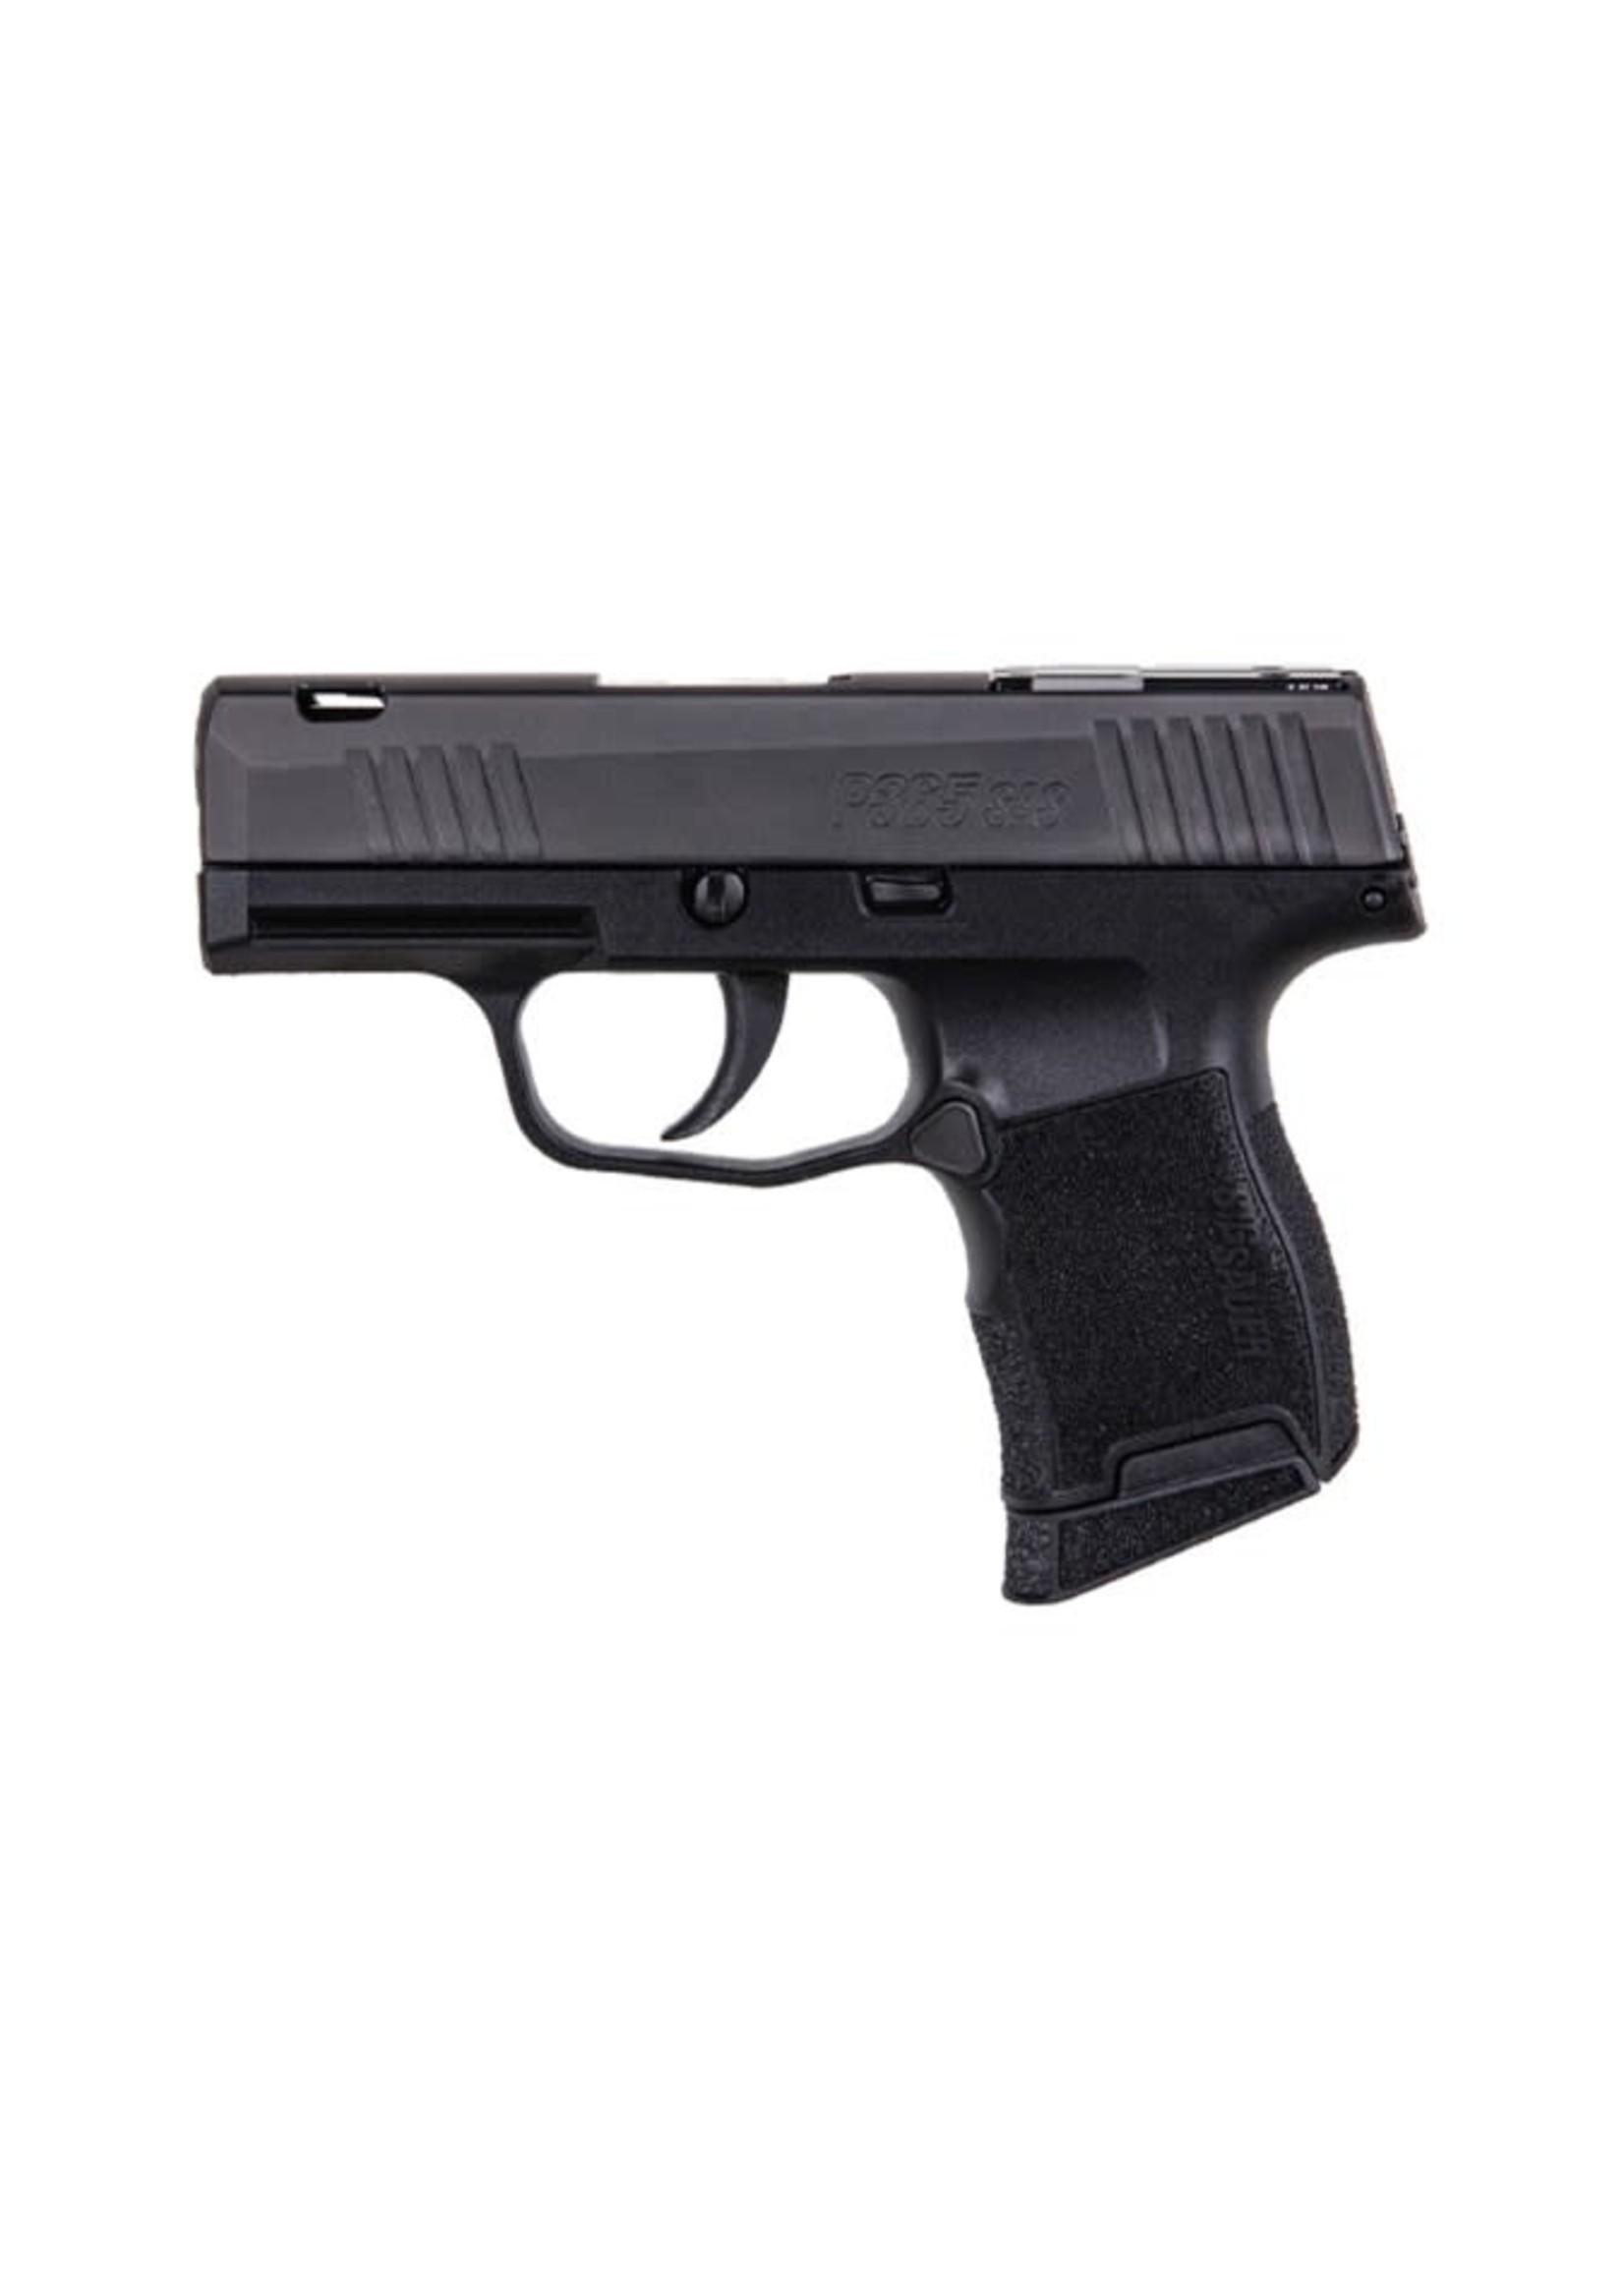 Sig Sauer SIG SAUER P365 SAS Pistol 9mm, 10+1, Ported